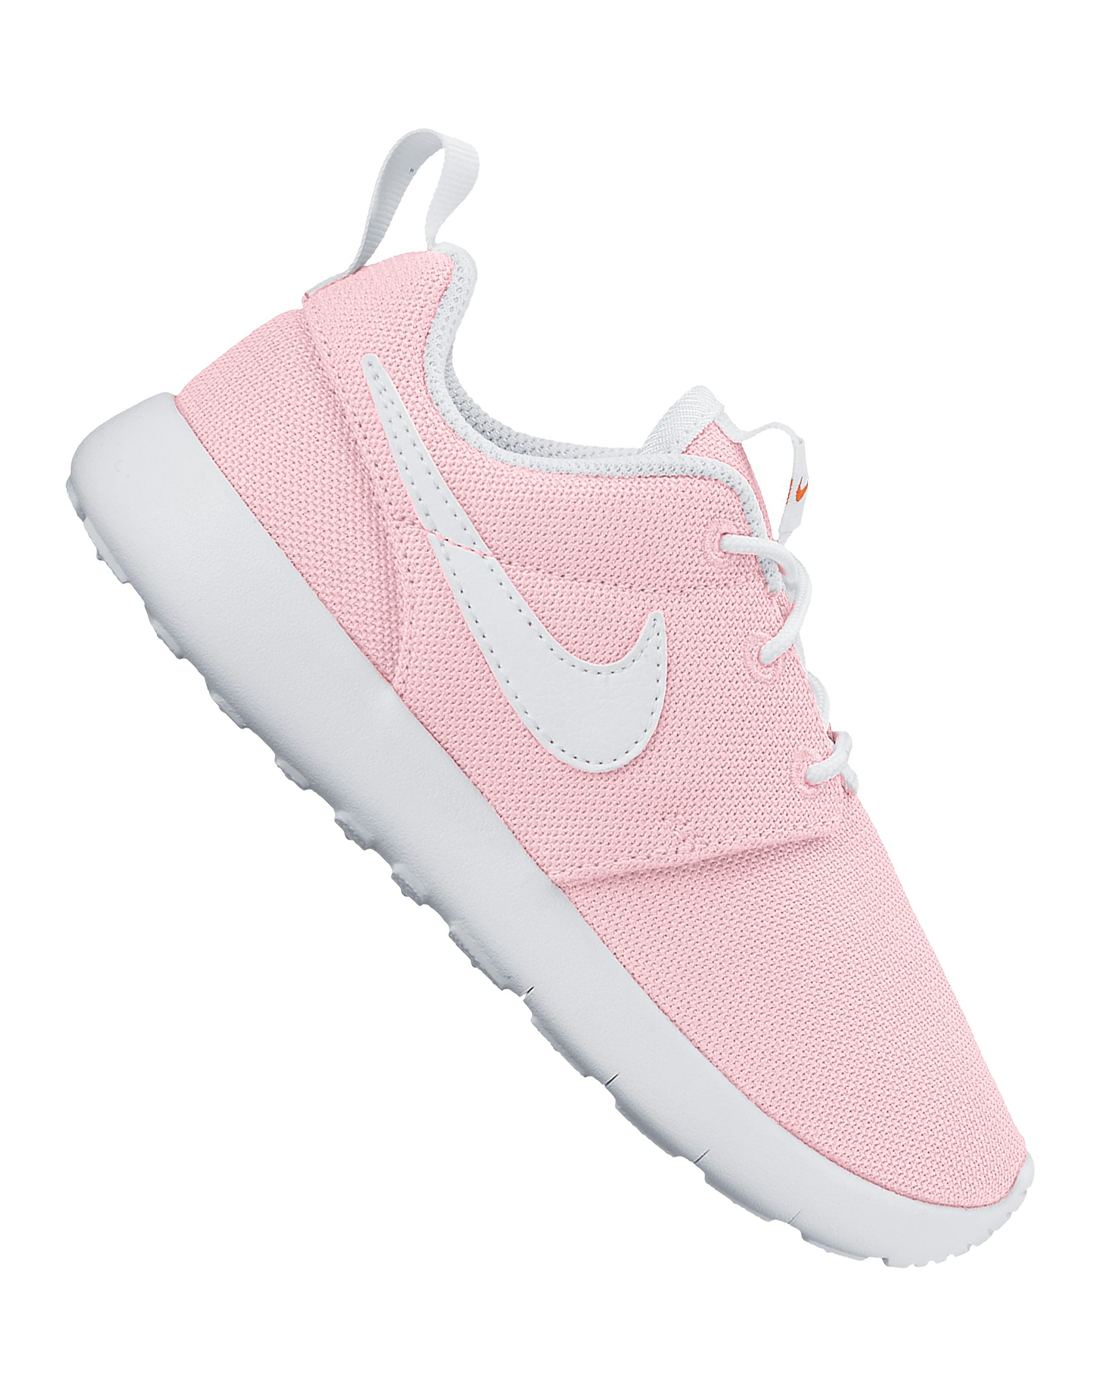 wholesale dealer 0fd57 e4ba1 Nike Younger Girls Roshe One   Life Style Sports